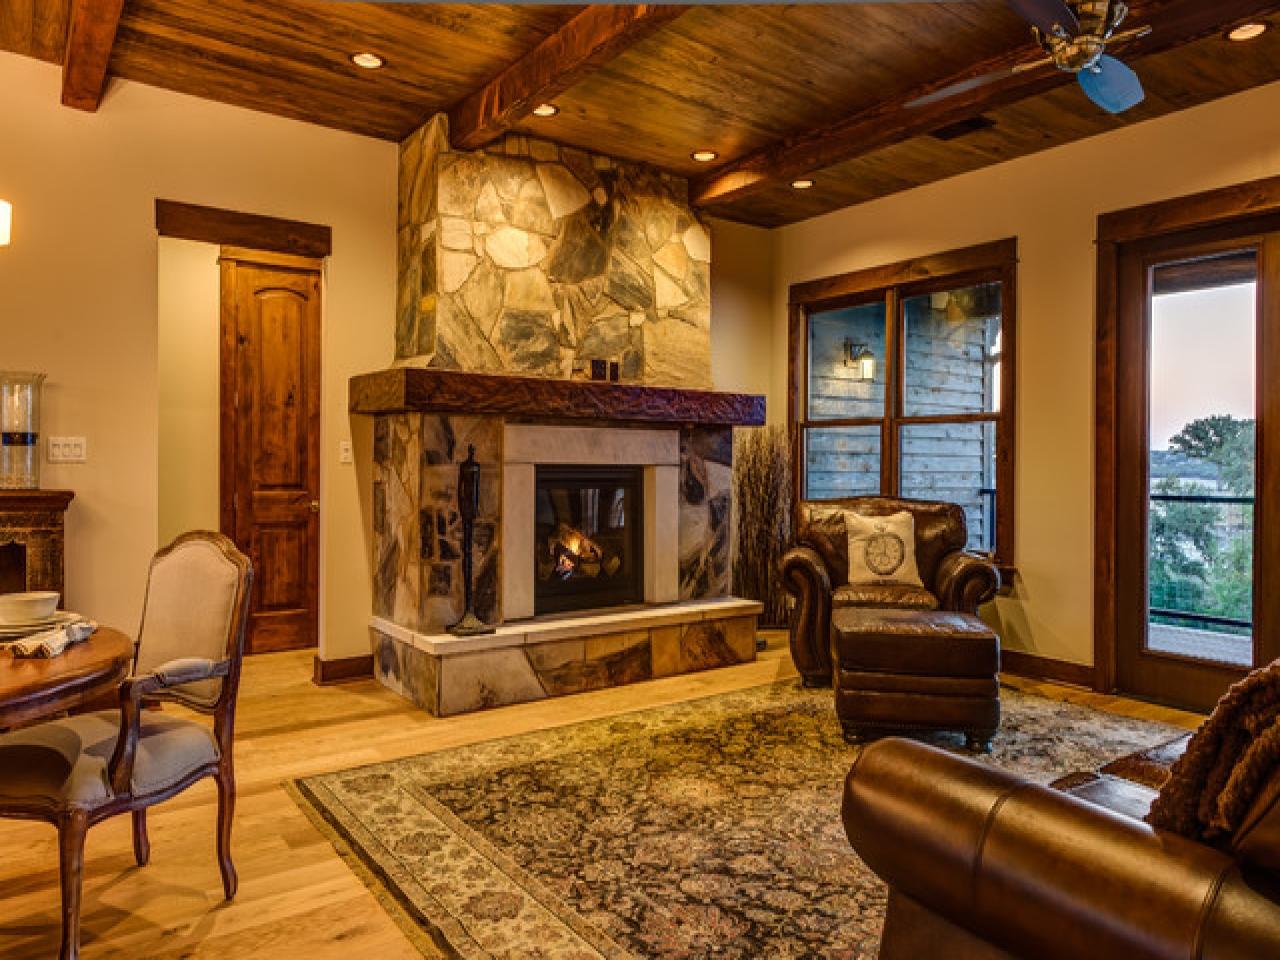 326 best Farmhouse Style images on Pinterest  Home ideas